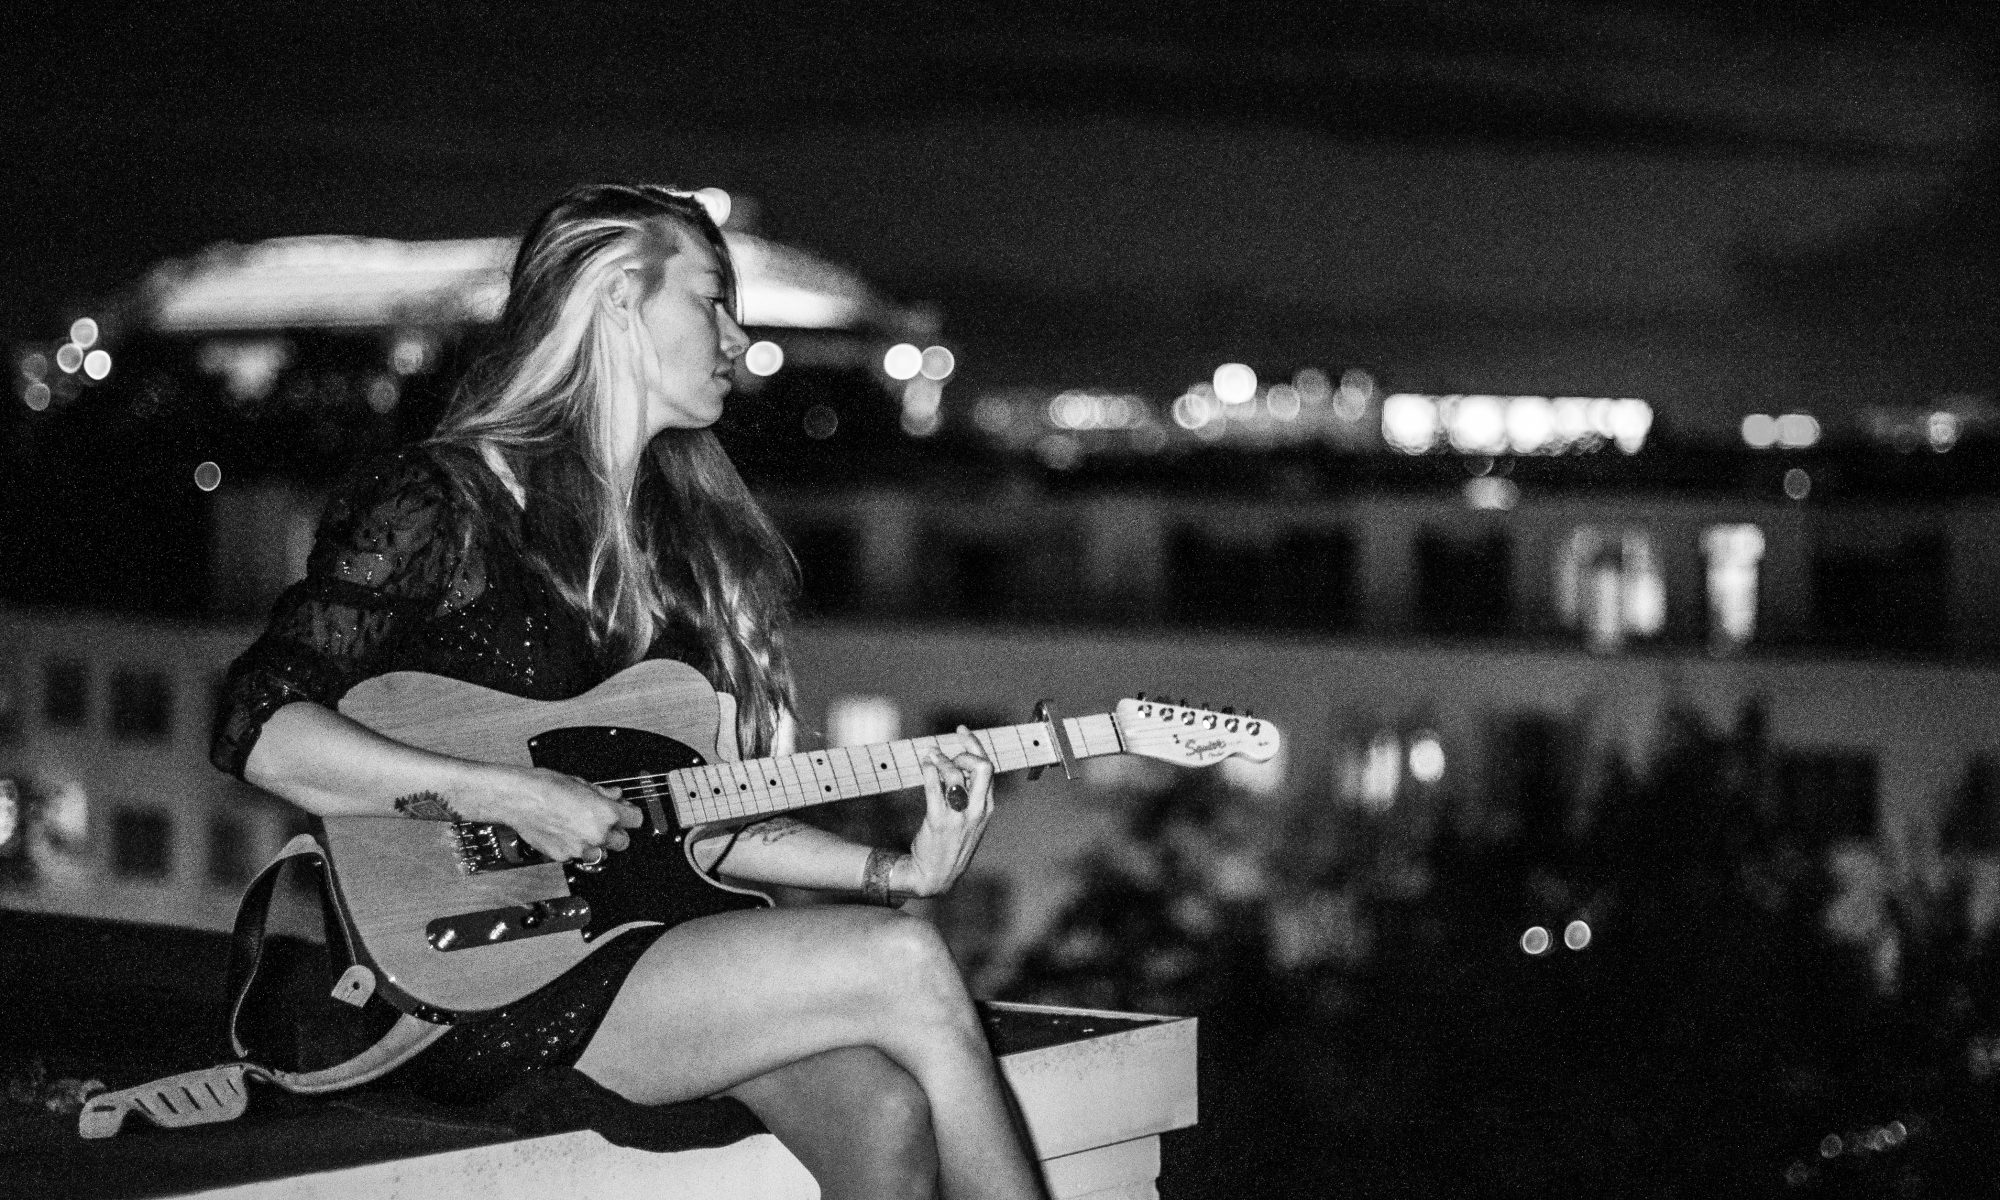 Mustang Lola - Americana Singer Songwriter from Amsterdam